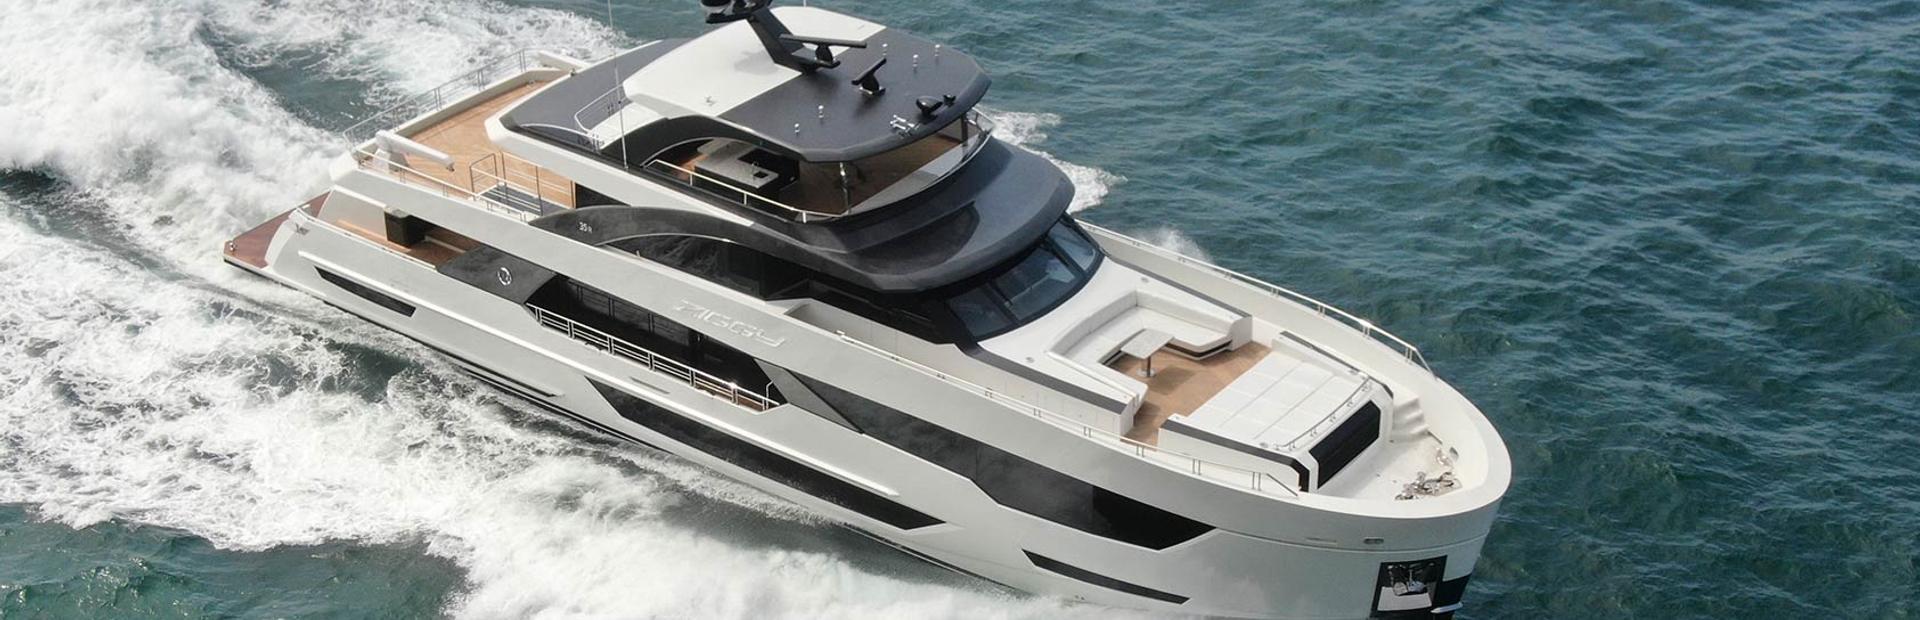 35R Yacht Charter